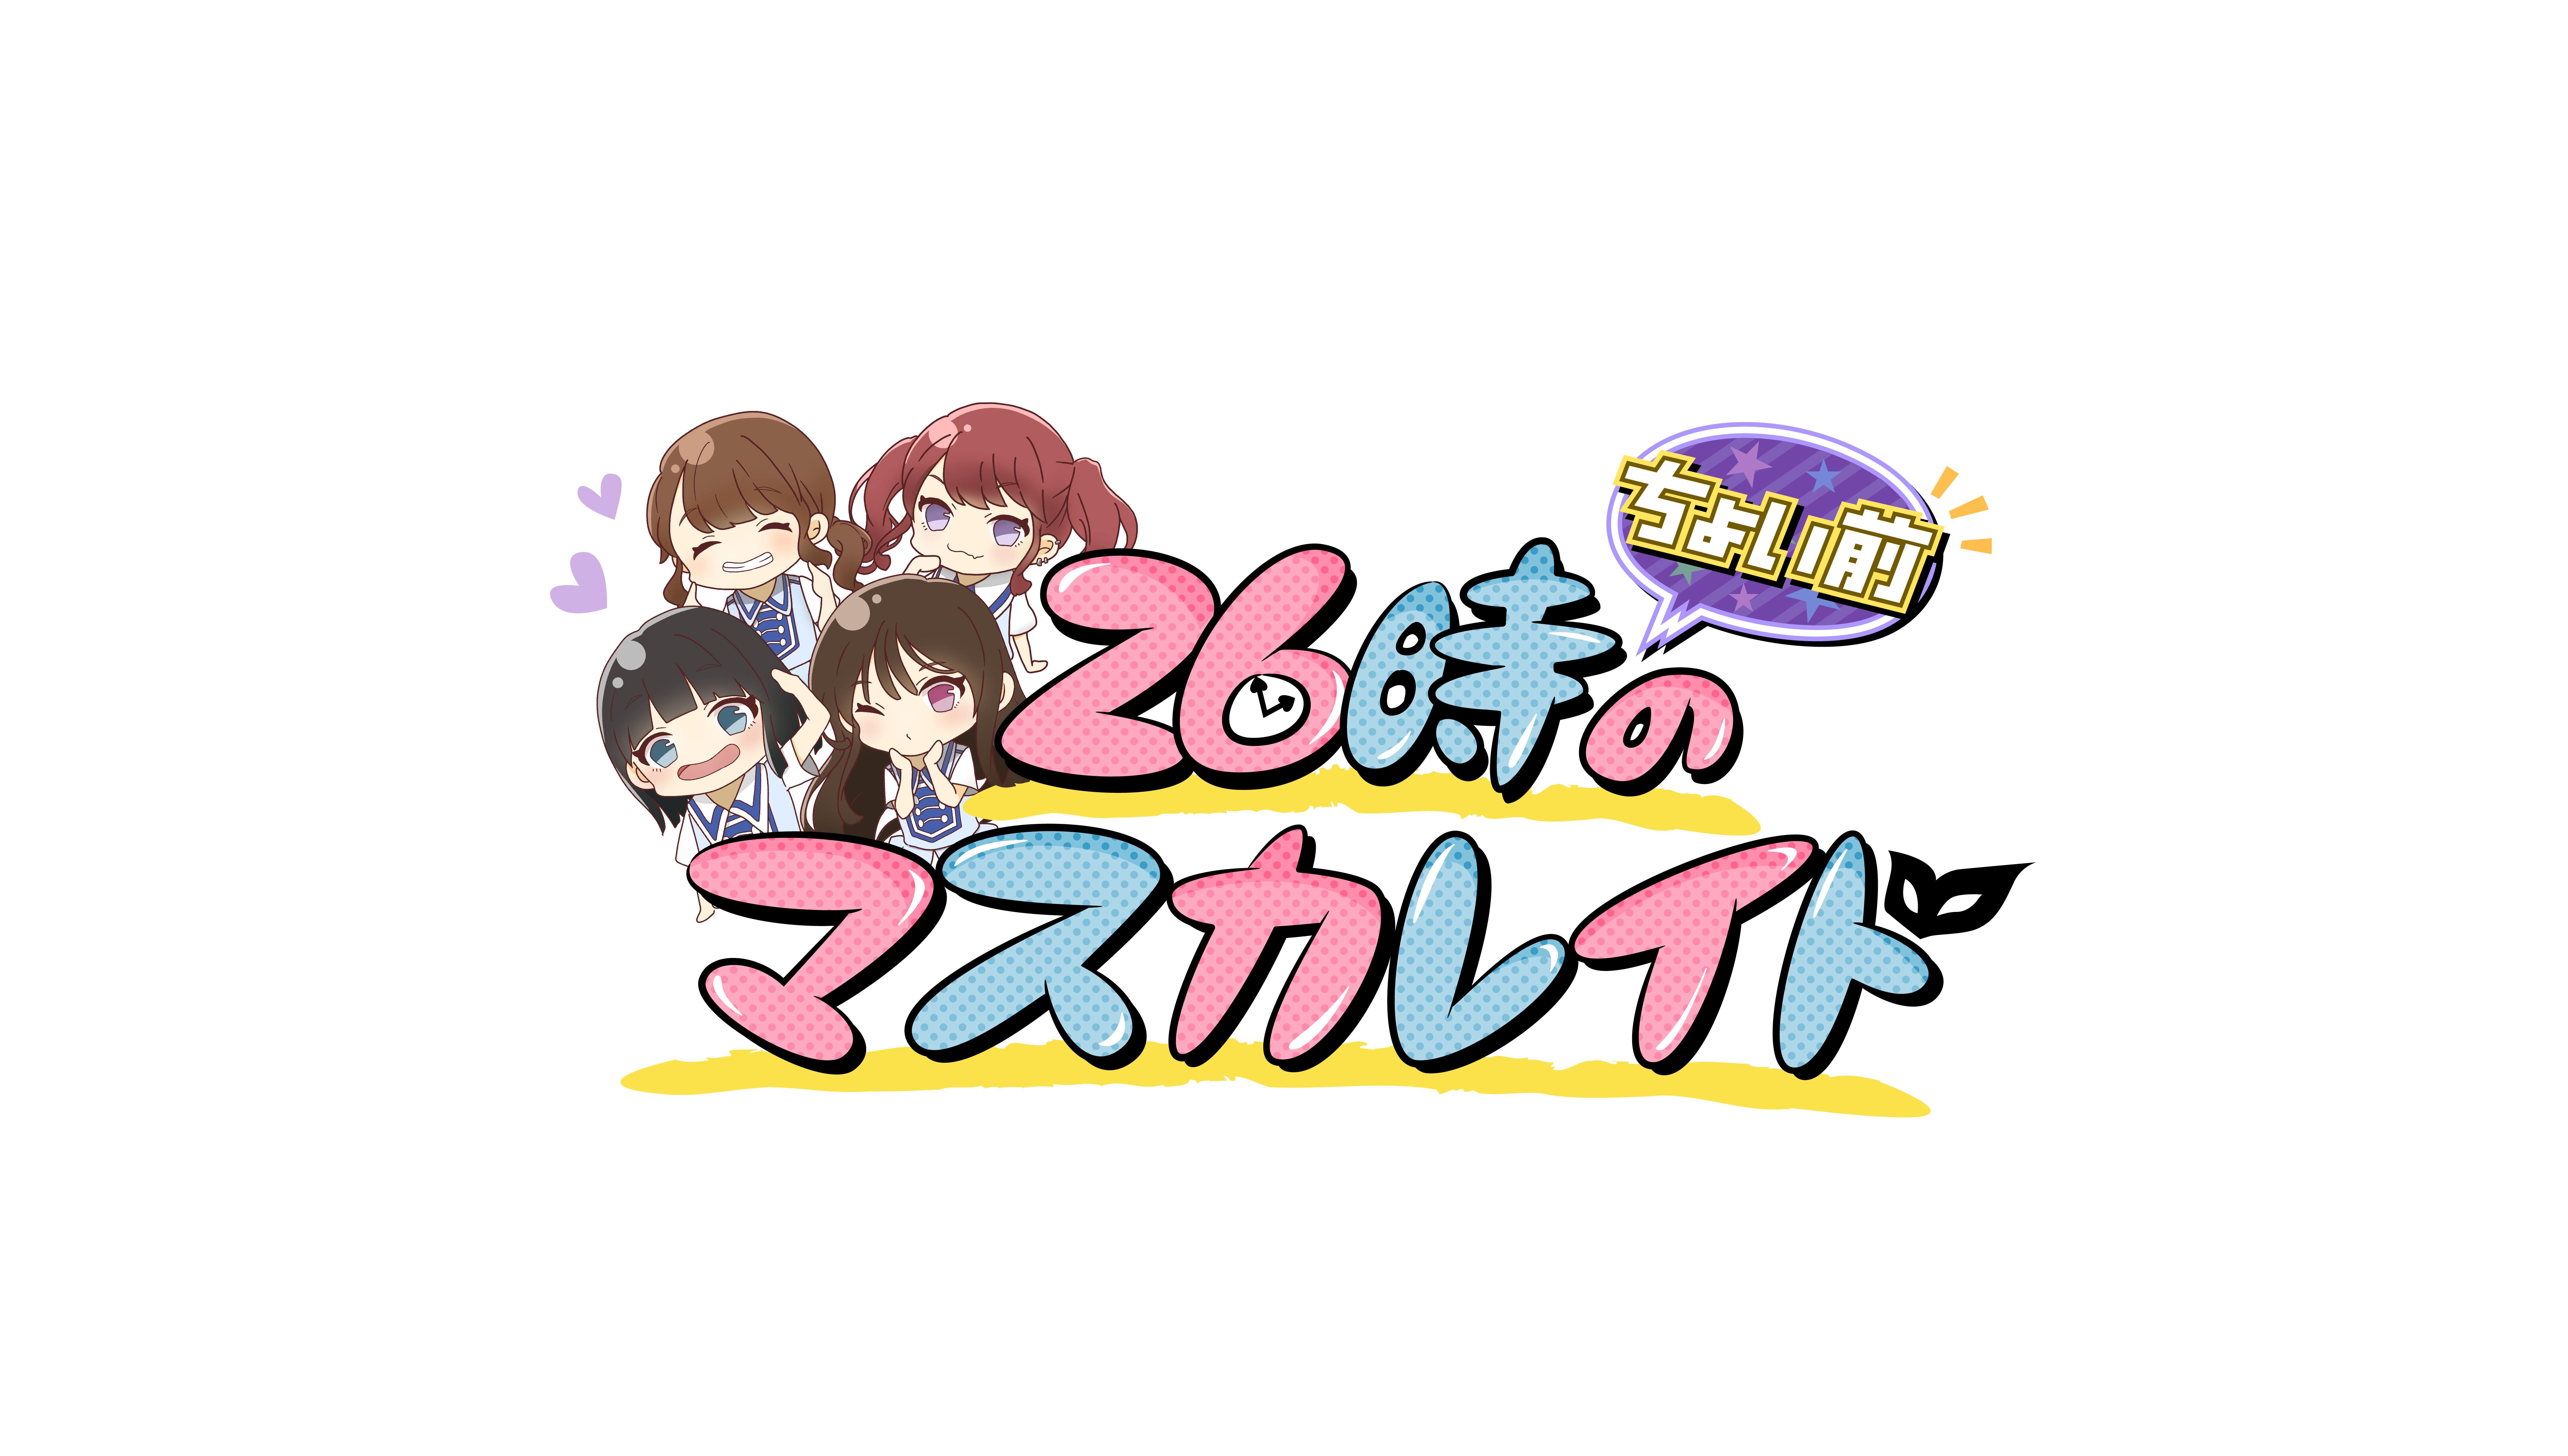 nichomas_logo.jpg